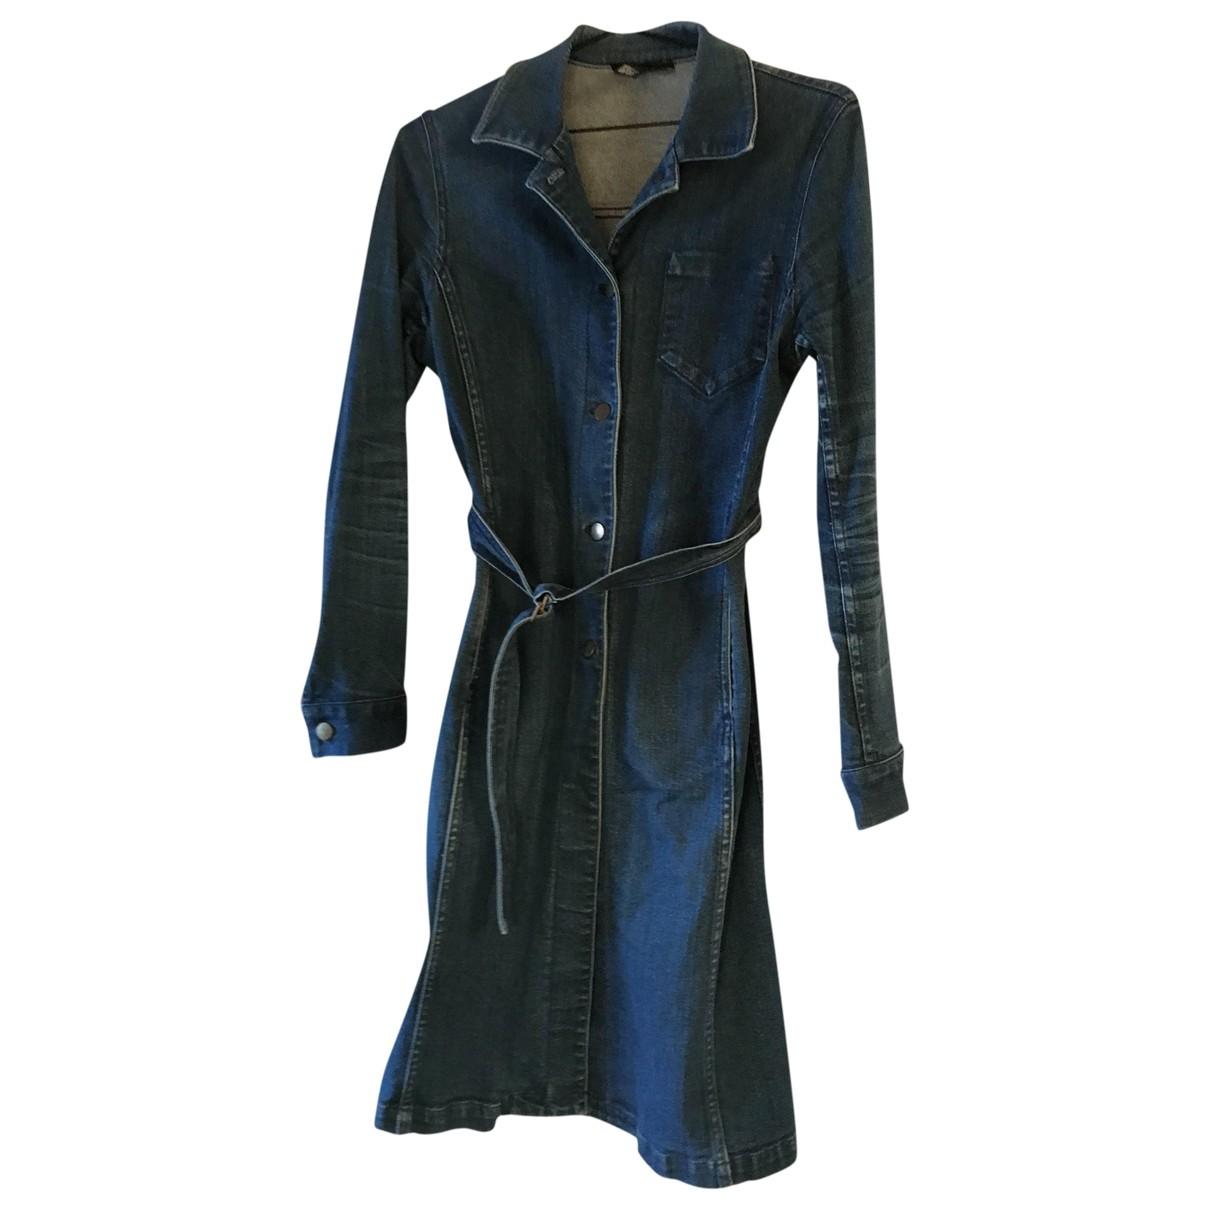 Dkny \N Blue Denim - Jeans dress for Women 8 UK